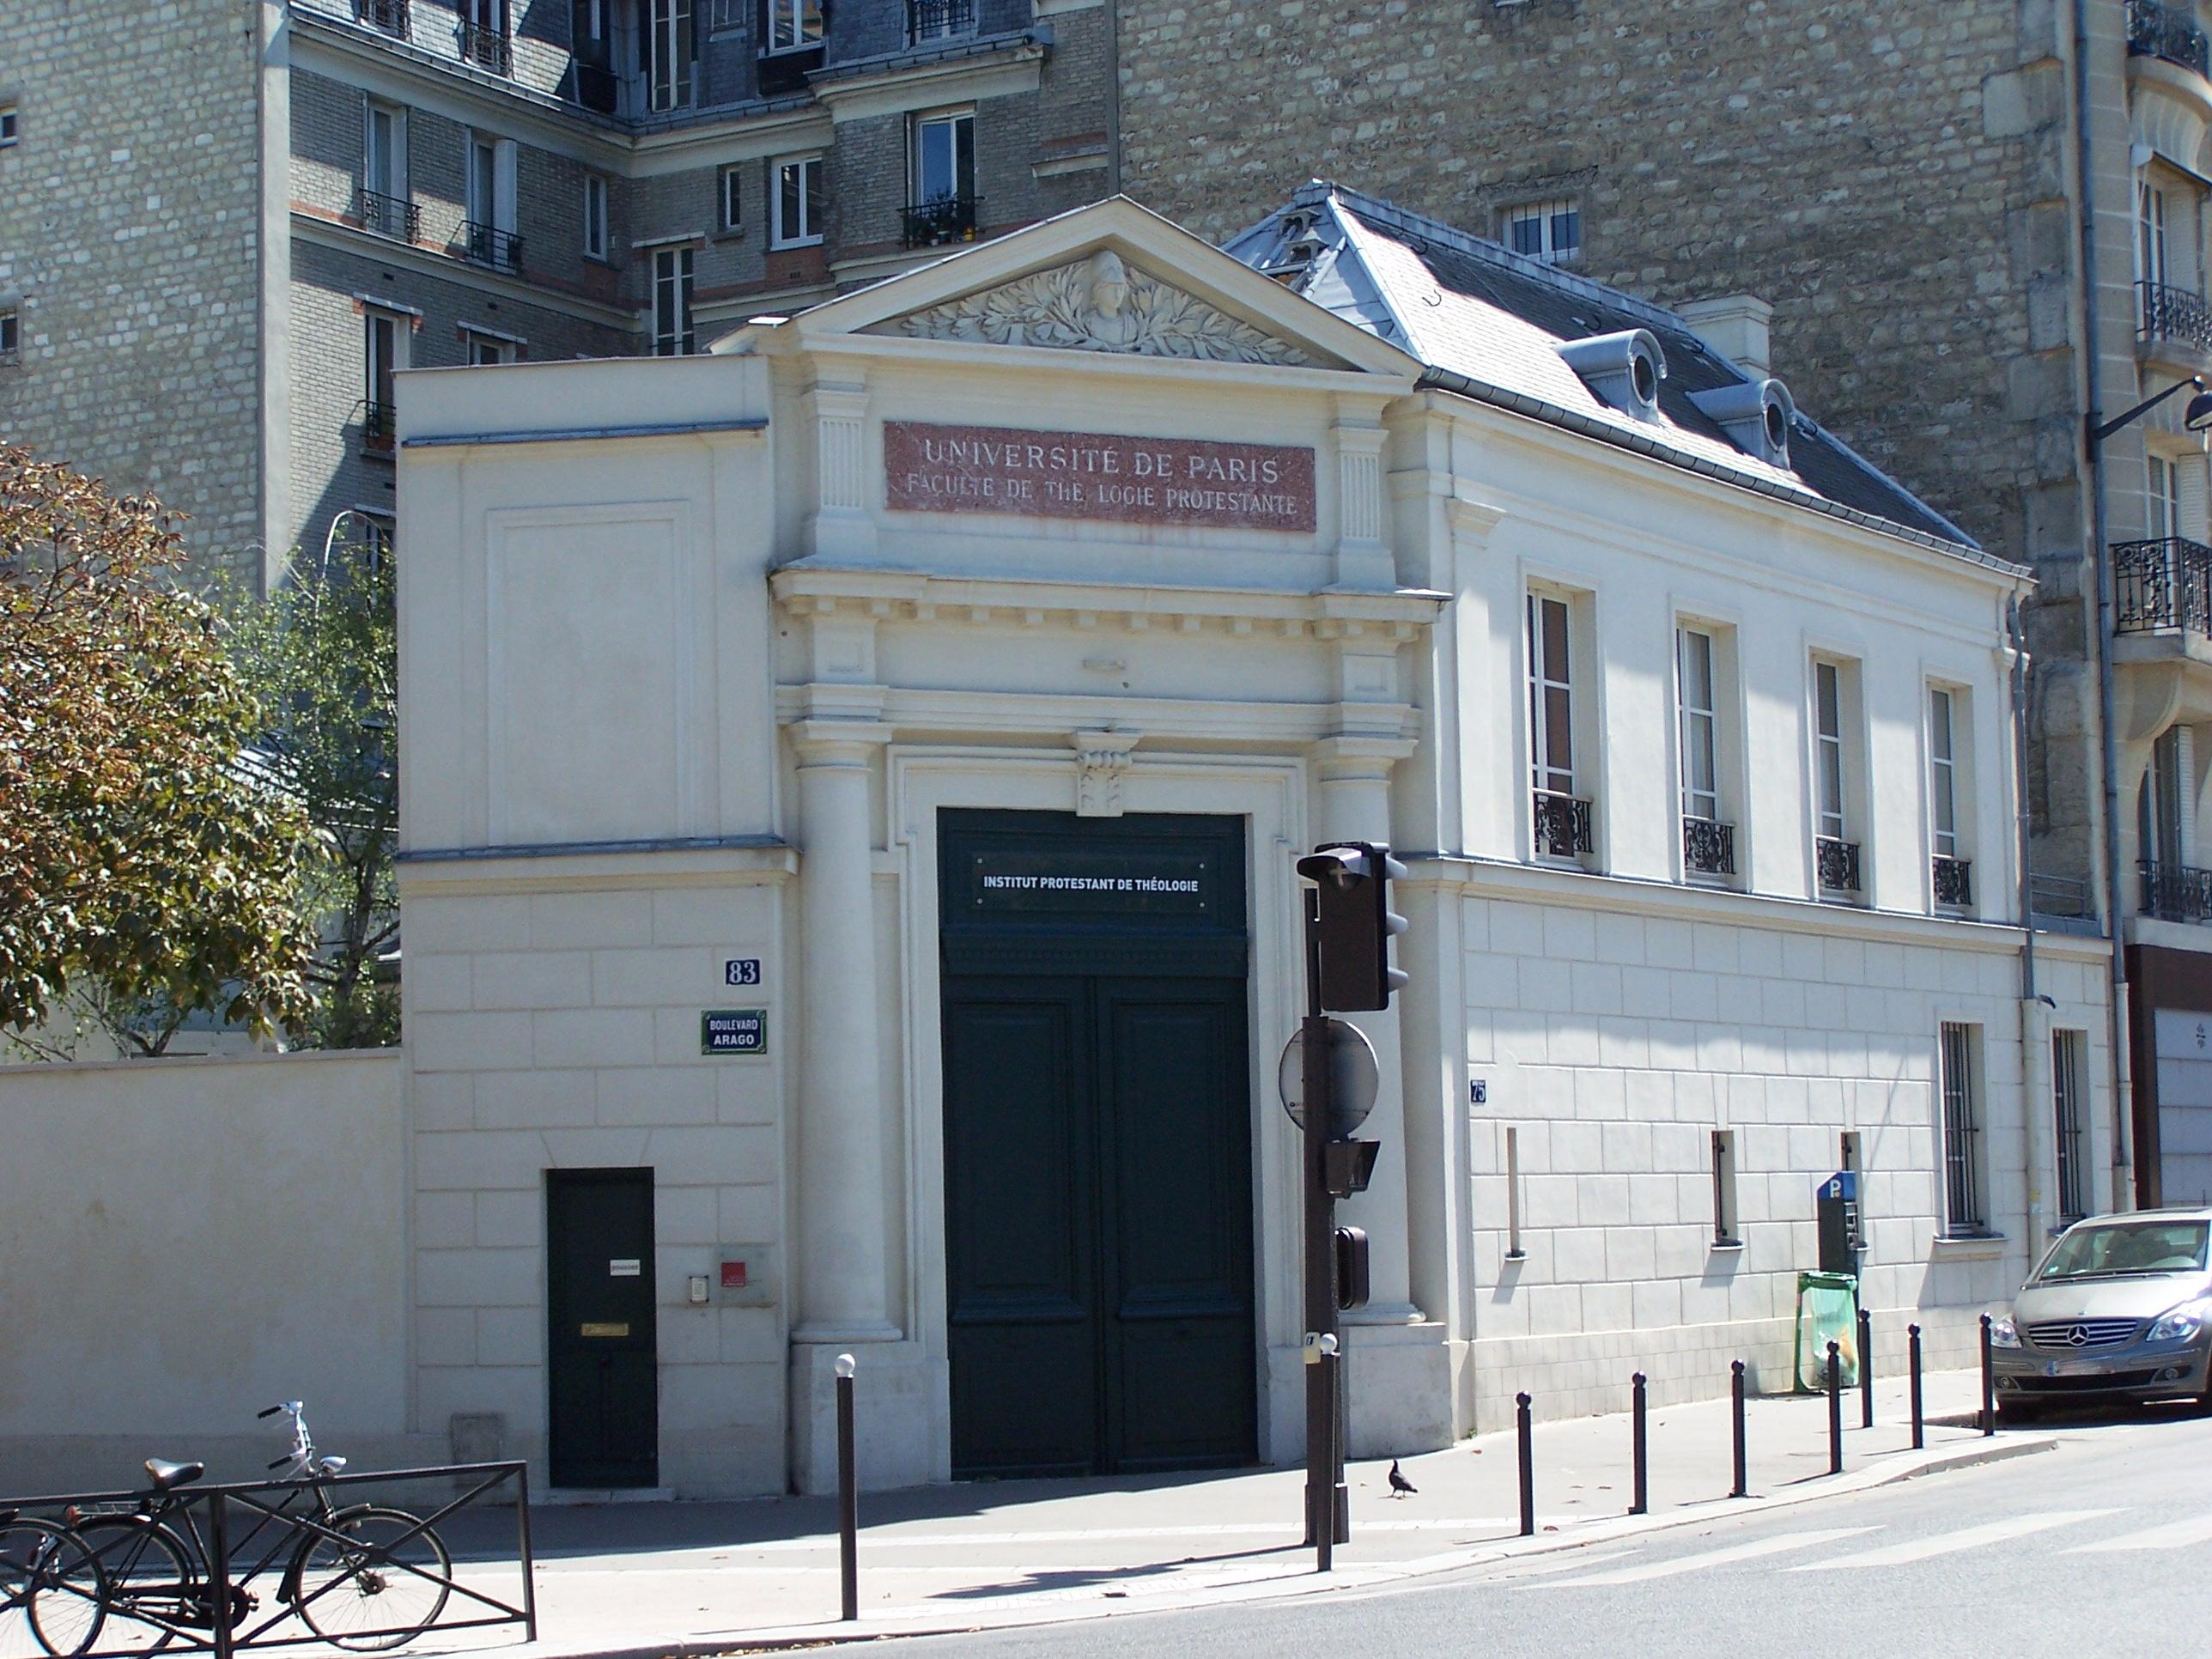 http://upload.wikimedia.org/wikipedia/commons/3/3f/Faculté_de_théologie_protestante.JPG